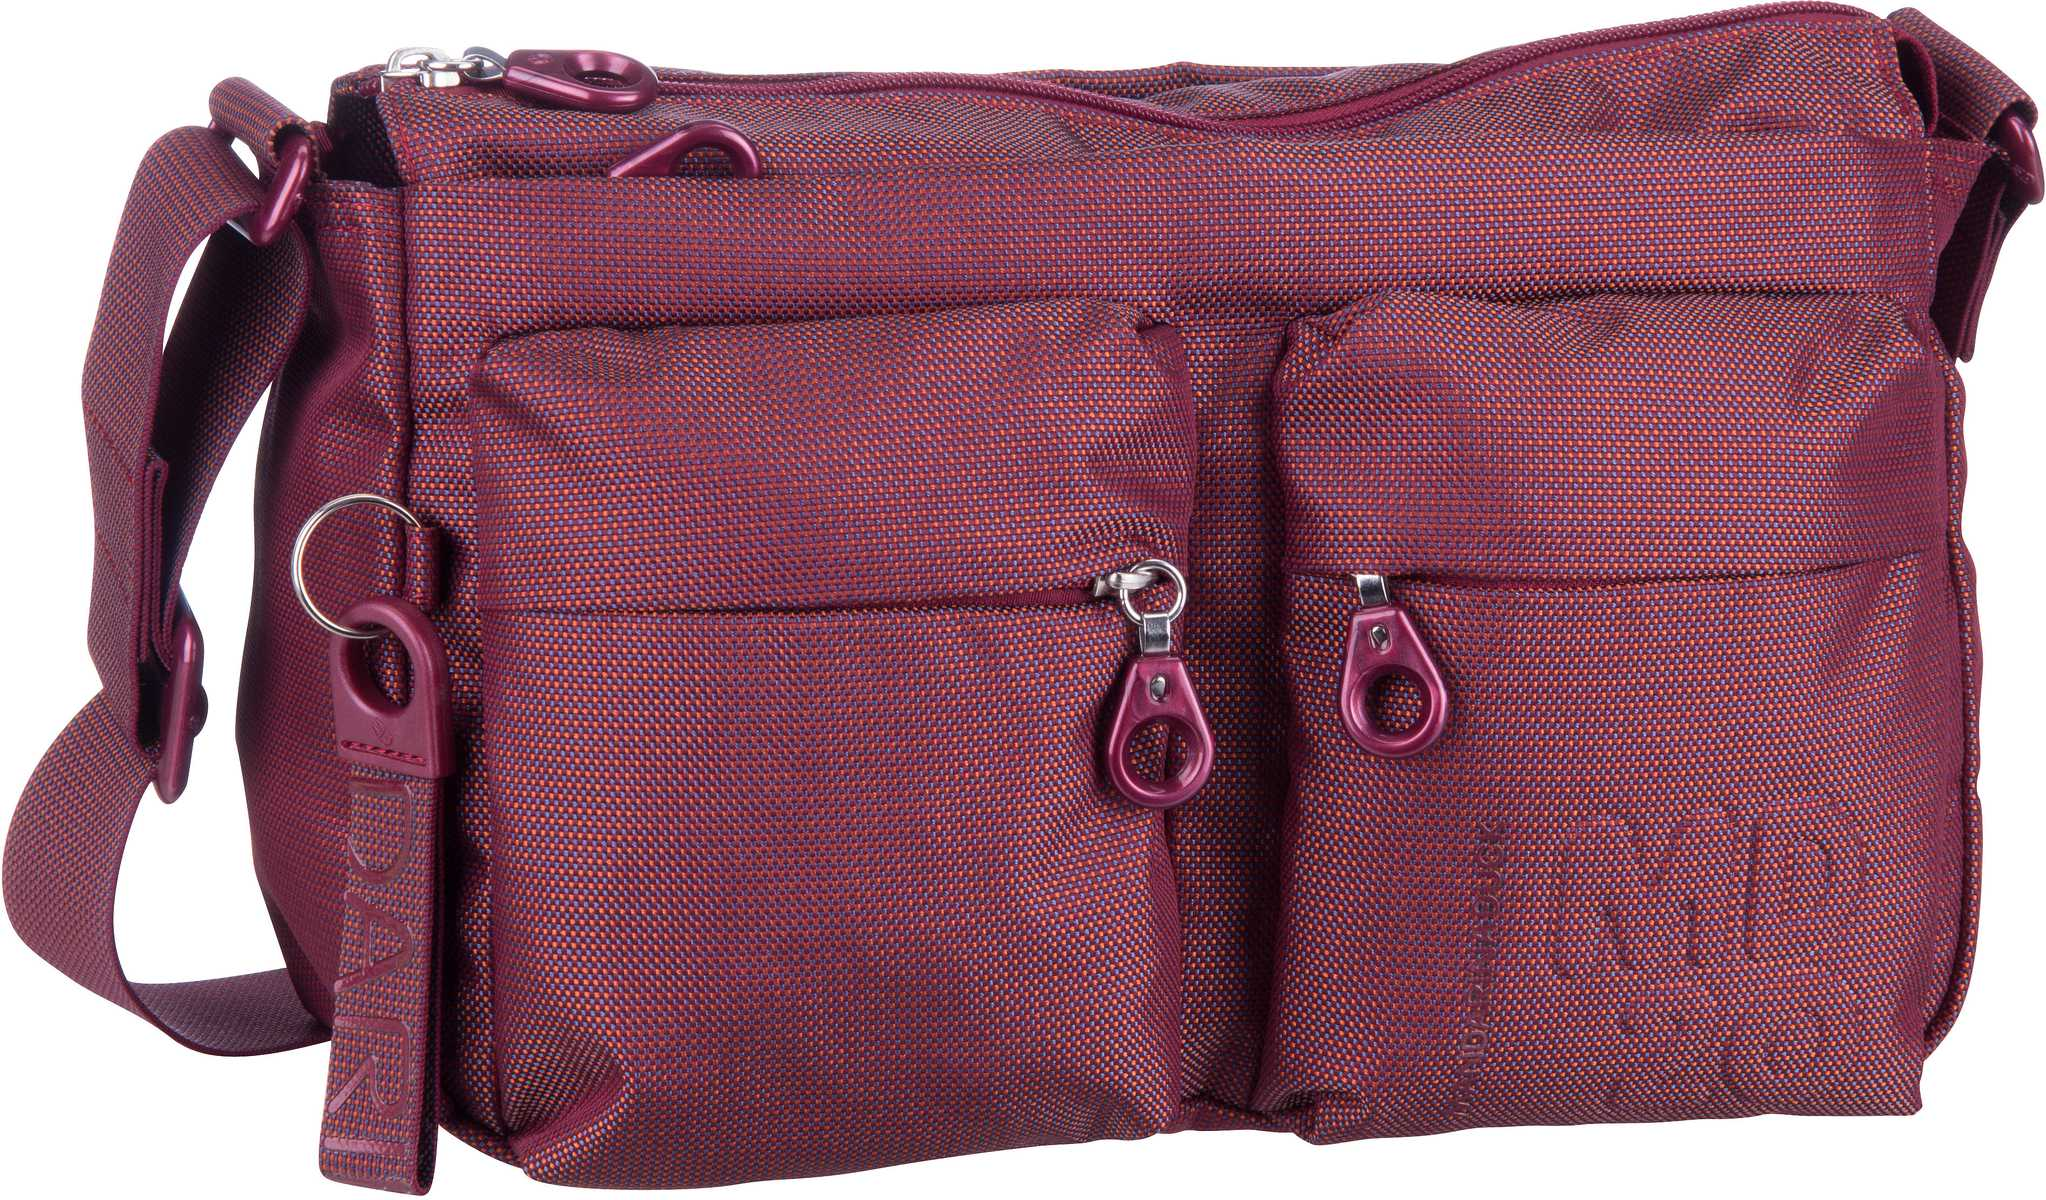 Umhängetasche MD20 Crossover Bag QMTX5 Cabernet